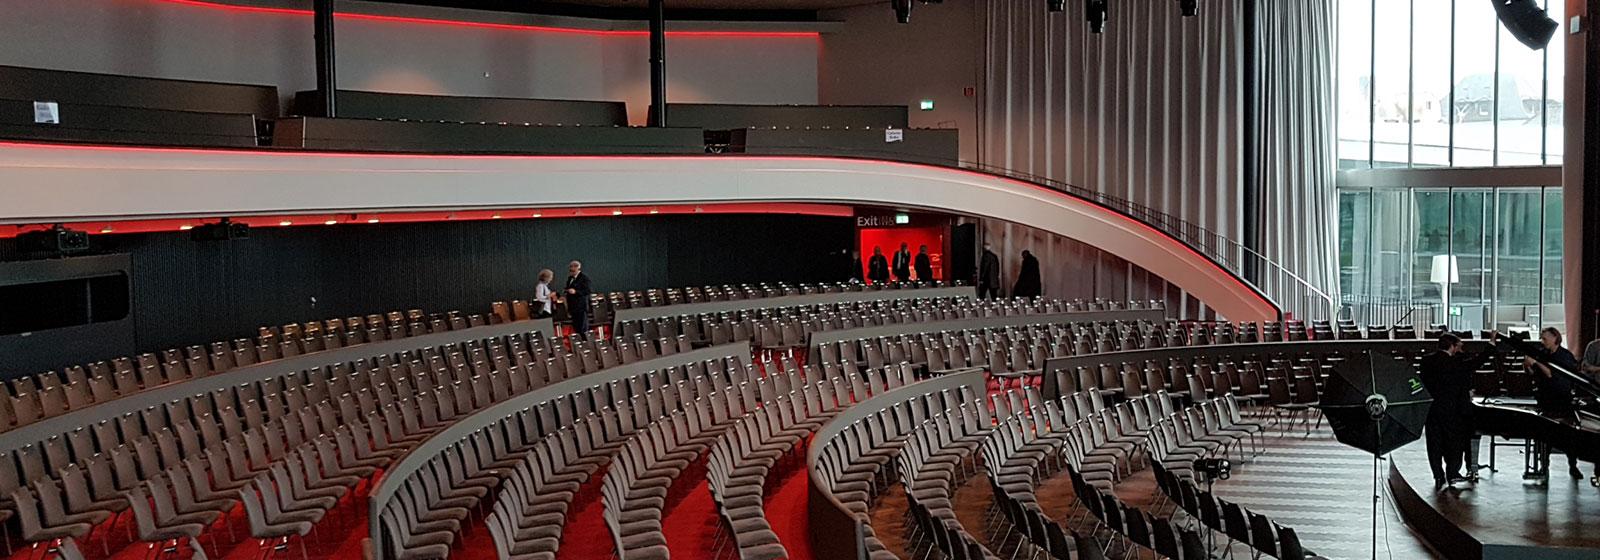 Kursaal Bern